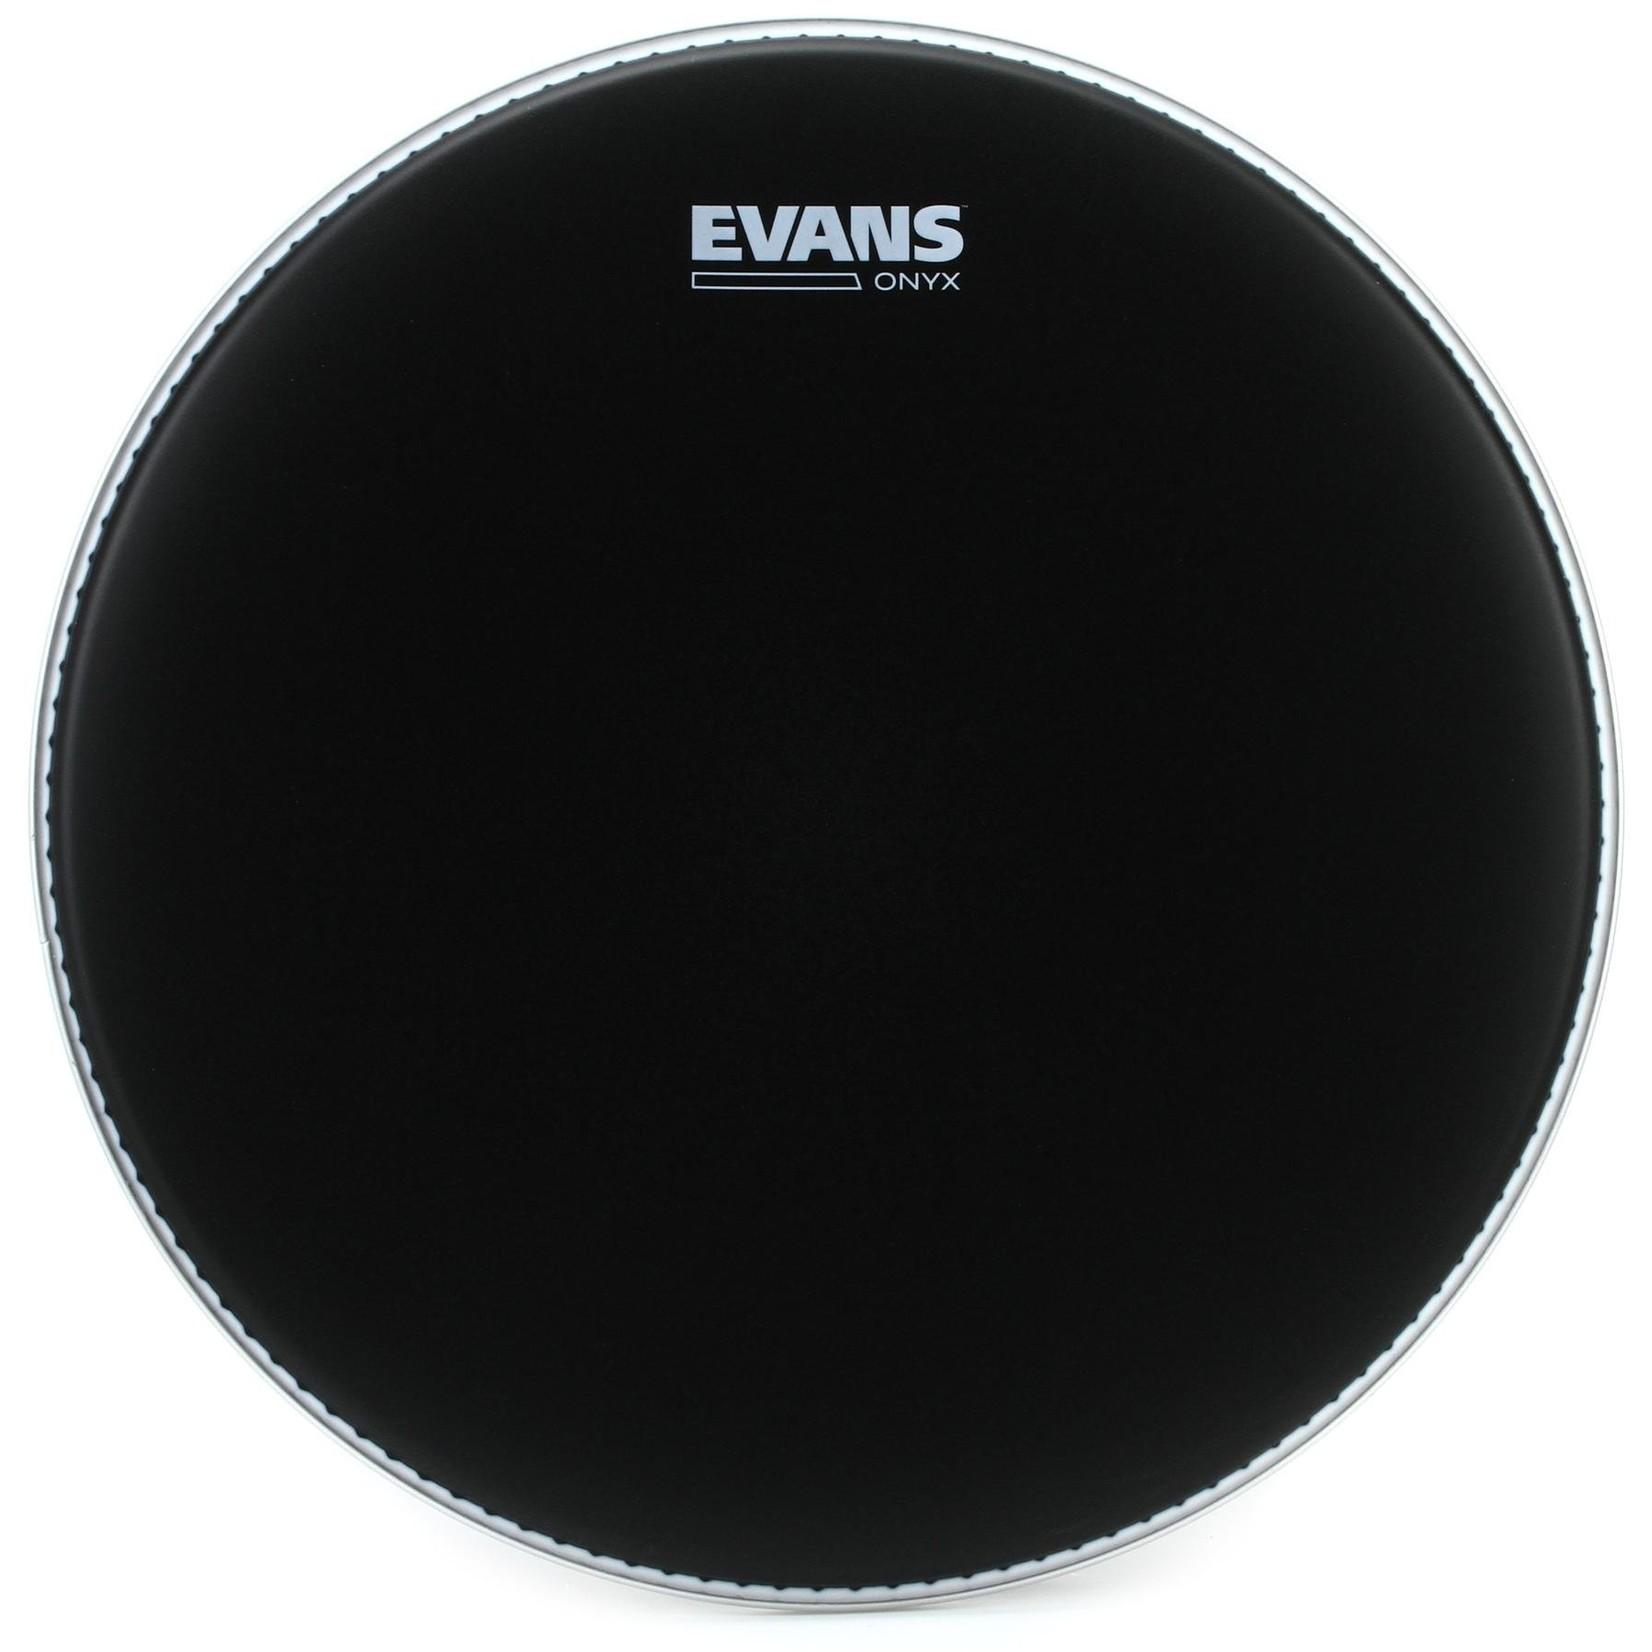 Evans Evans Coated Onyx 2-ply